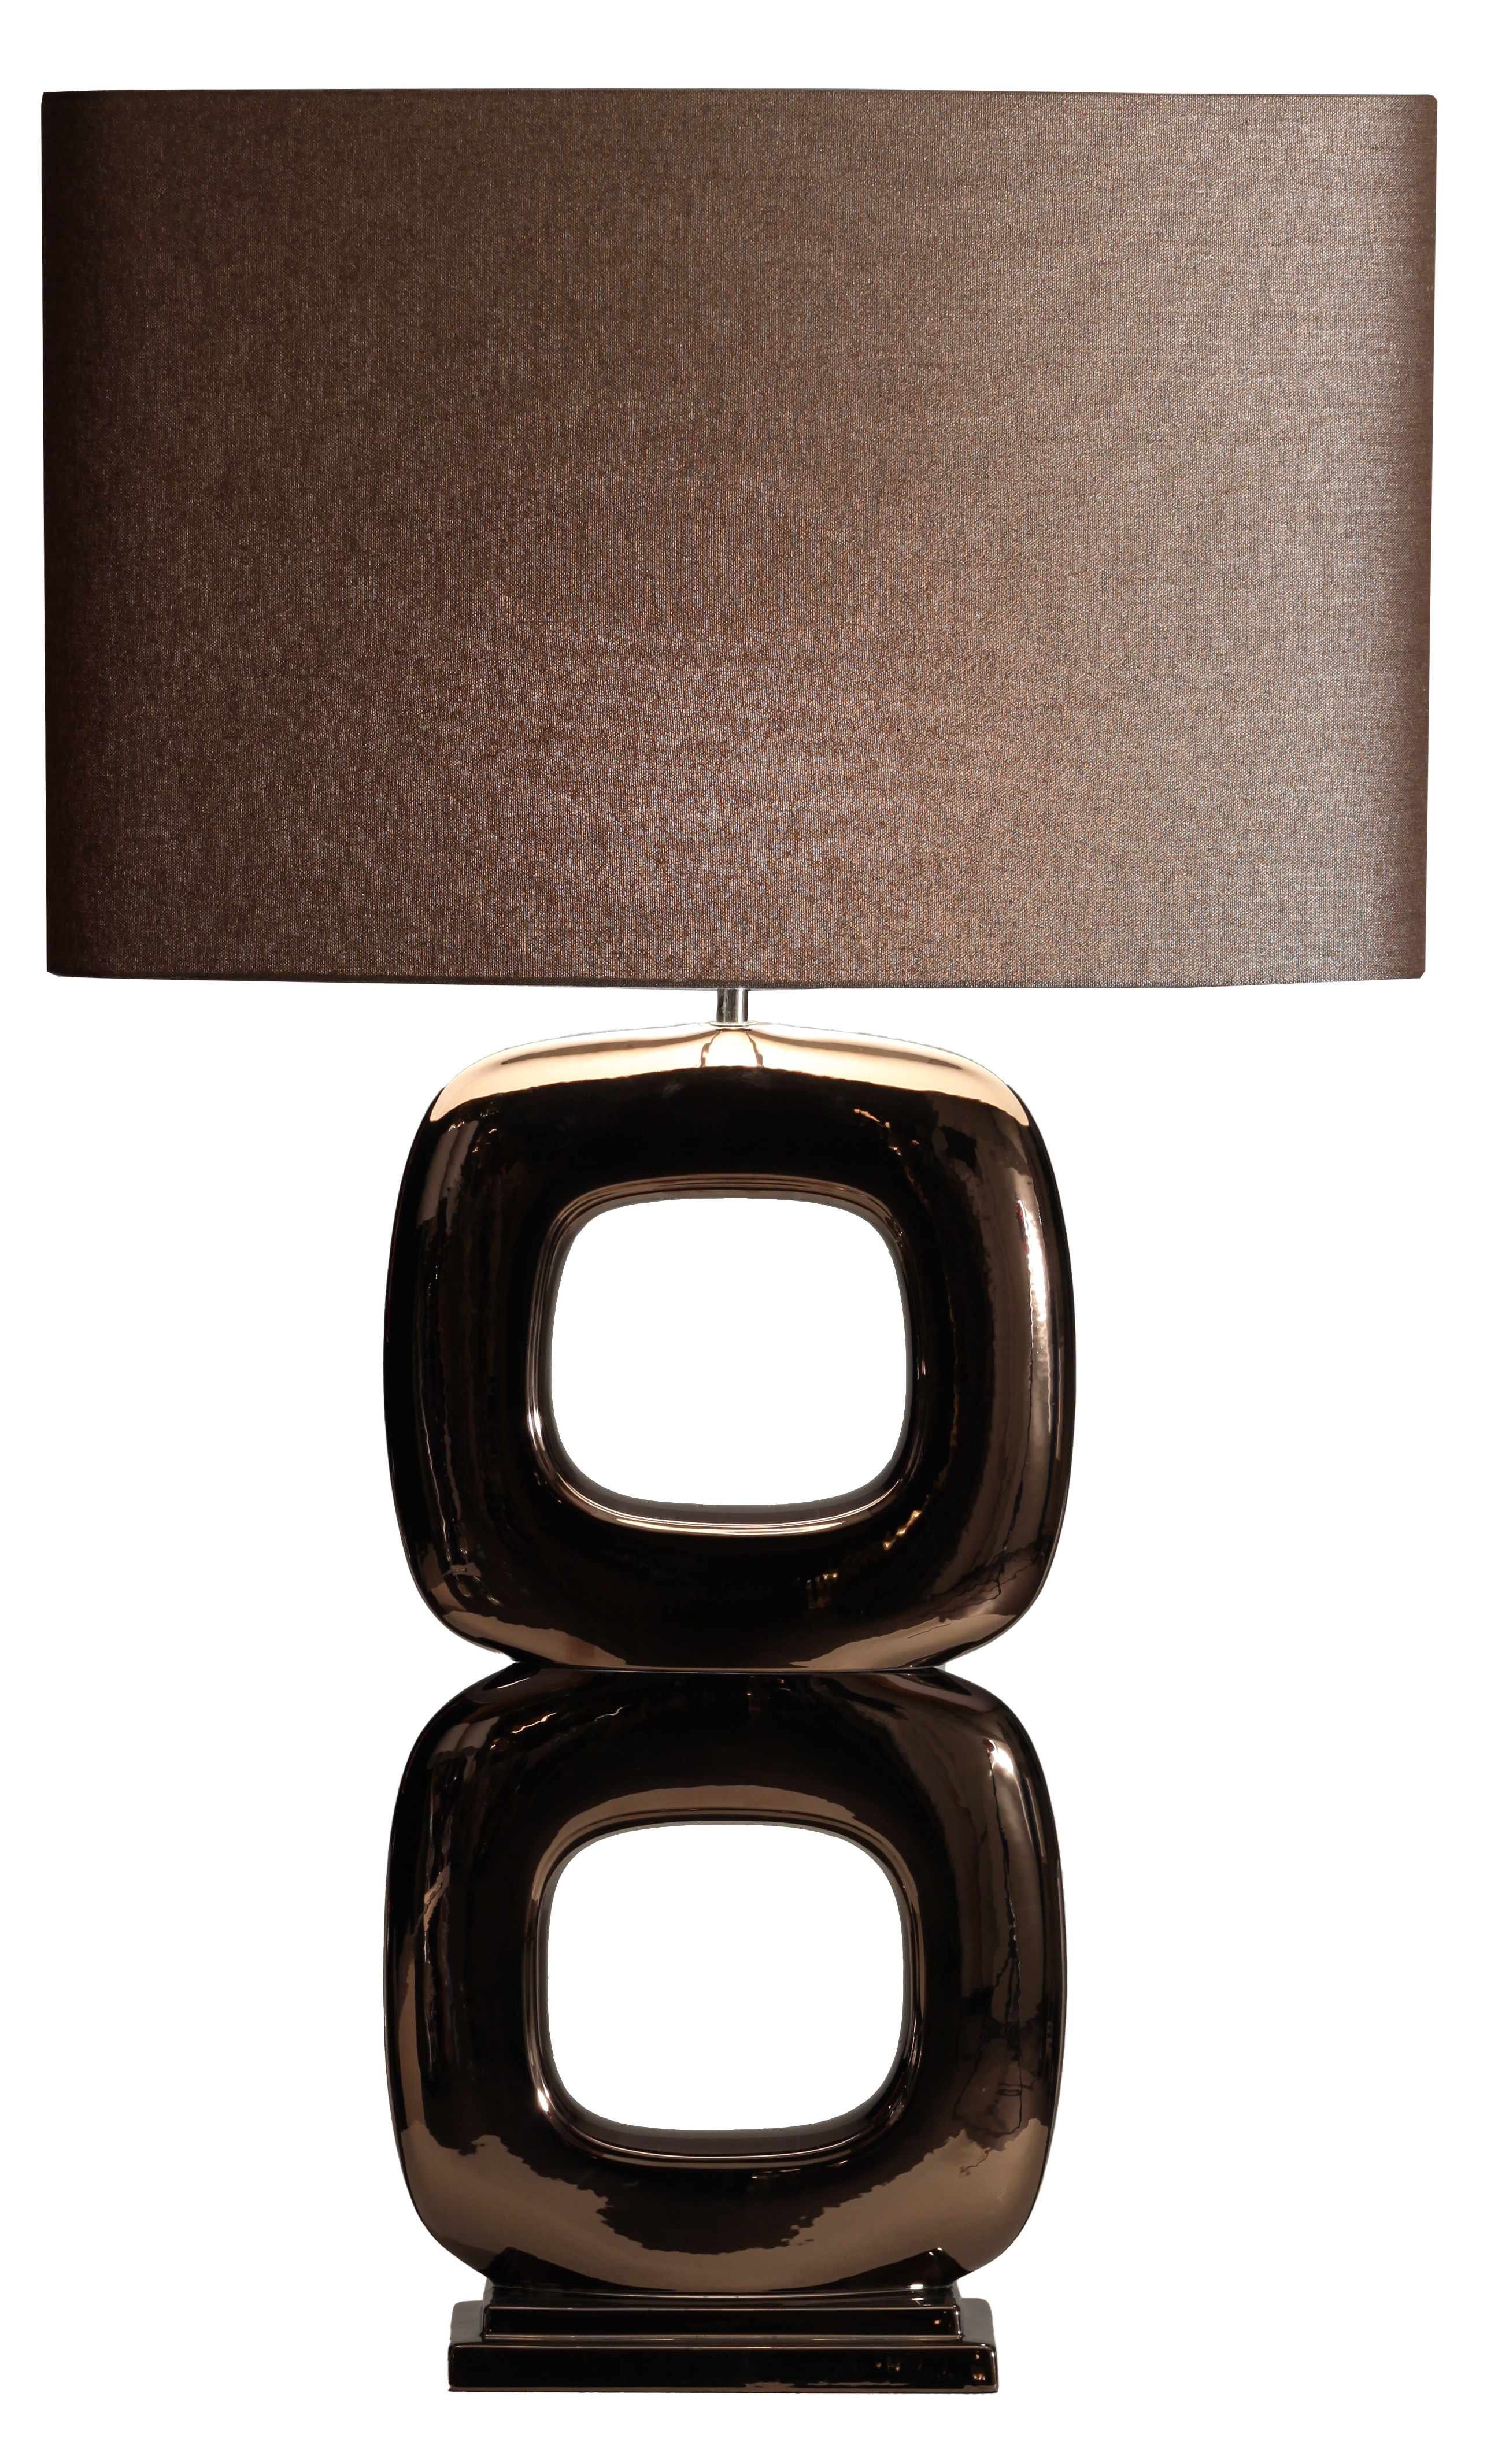 Stout Verlichting Collectie Sfeerfoto Tafellamp due quadrato Maxime